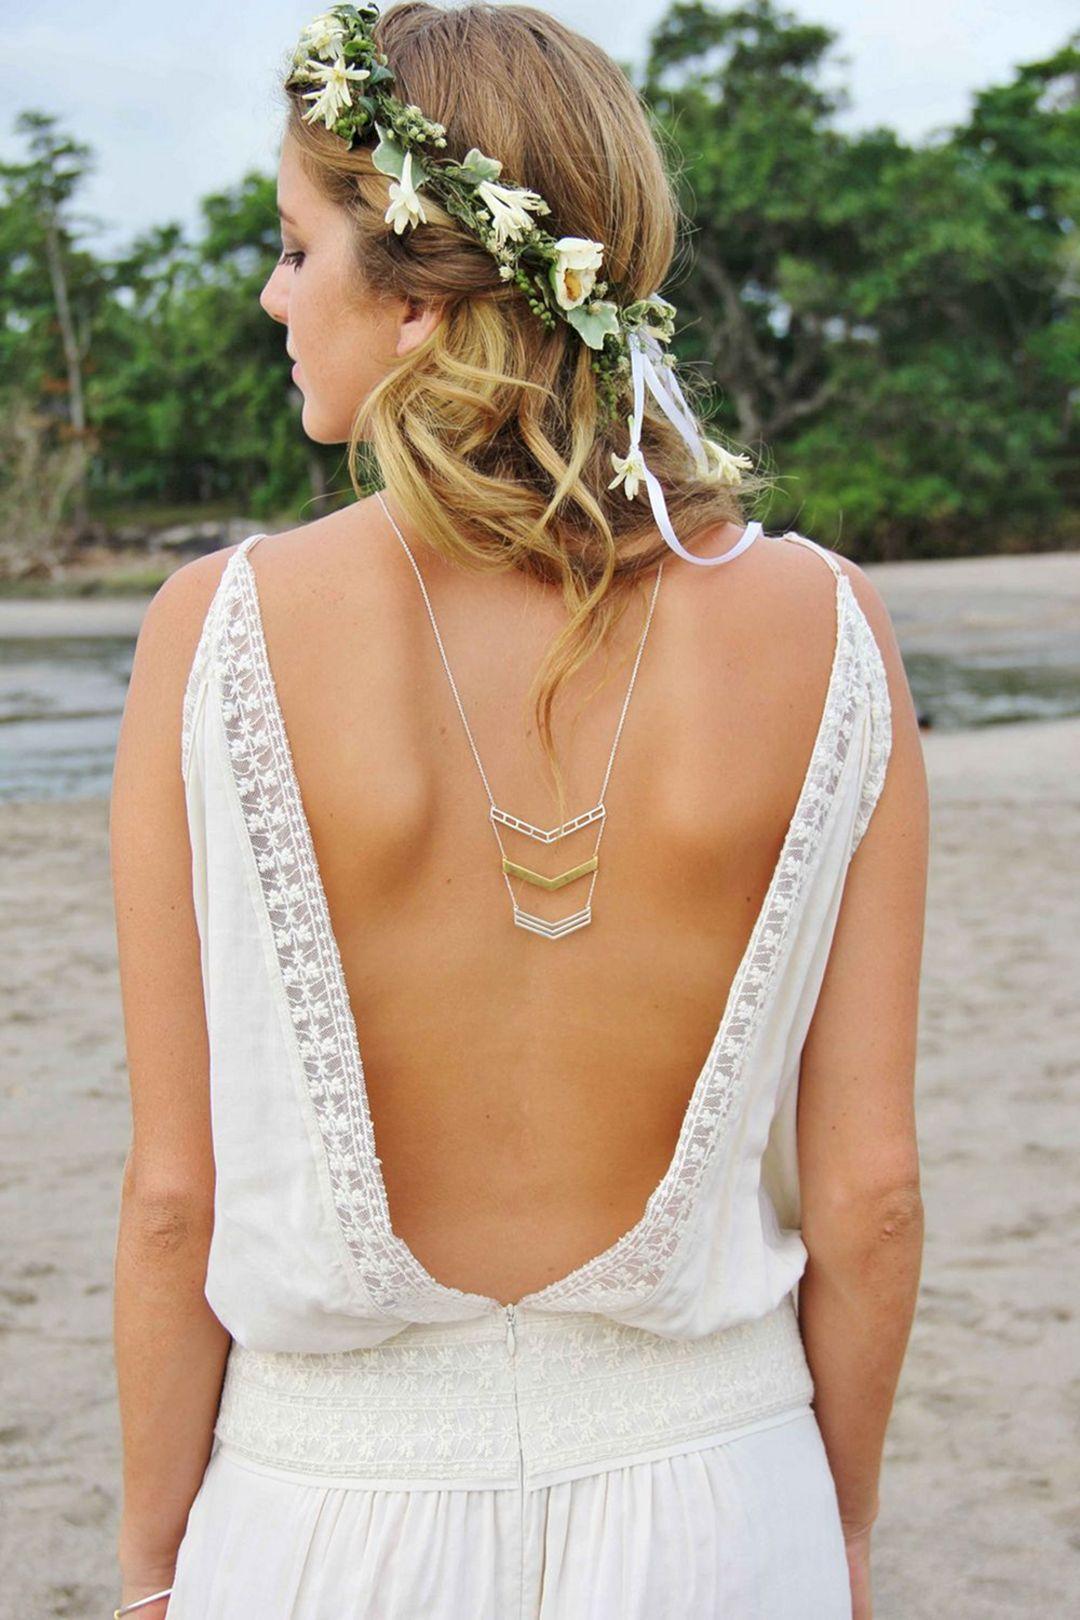 Top wedding short hairstyles with flower crown ideas flower